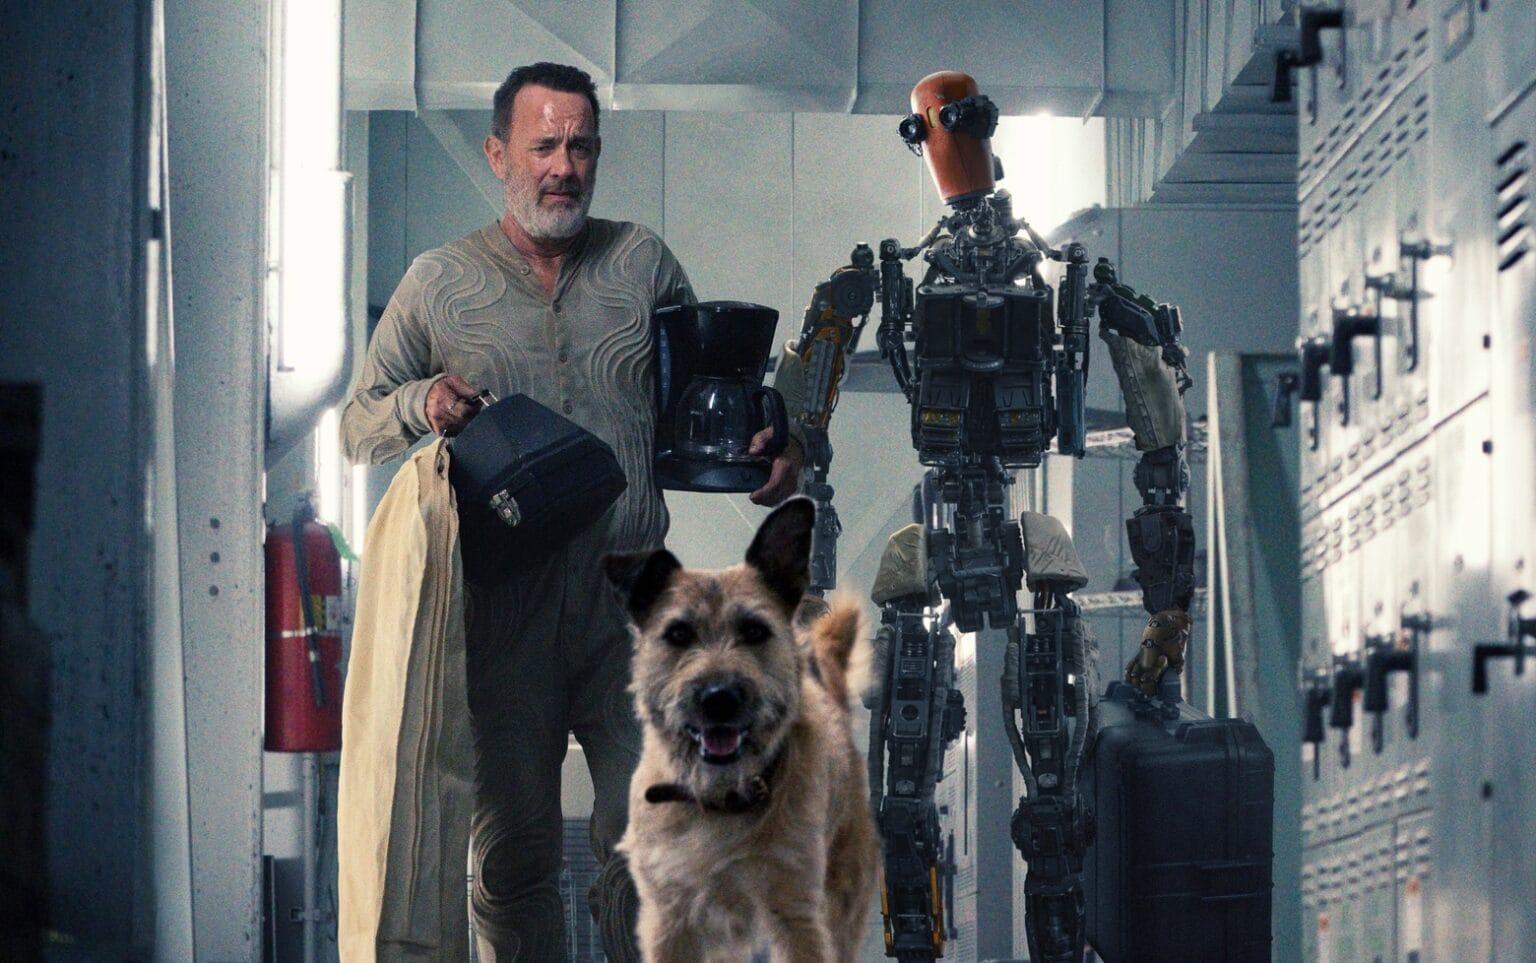 Tom Hanks sci-fi charmer 'Finch' premieres on Apple TV+ Nov. 5